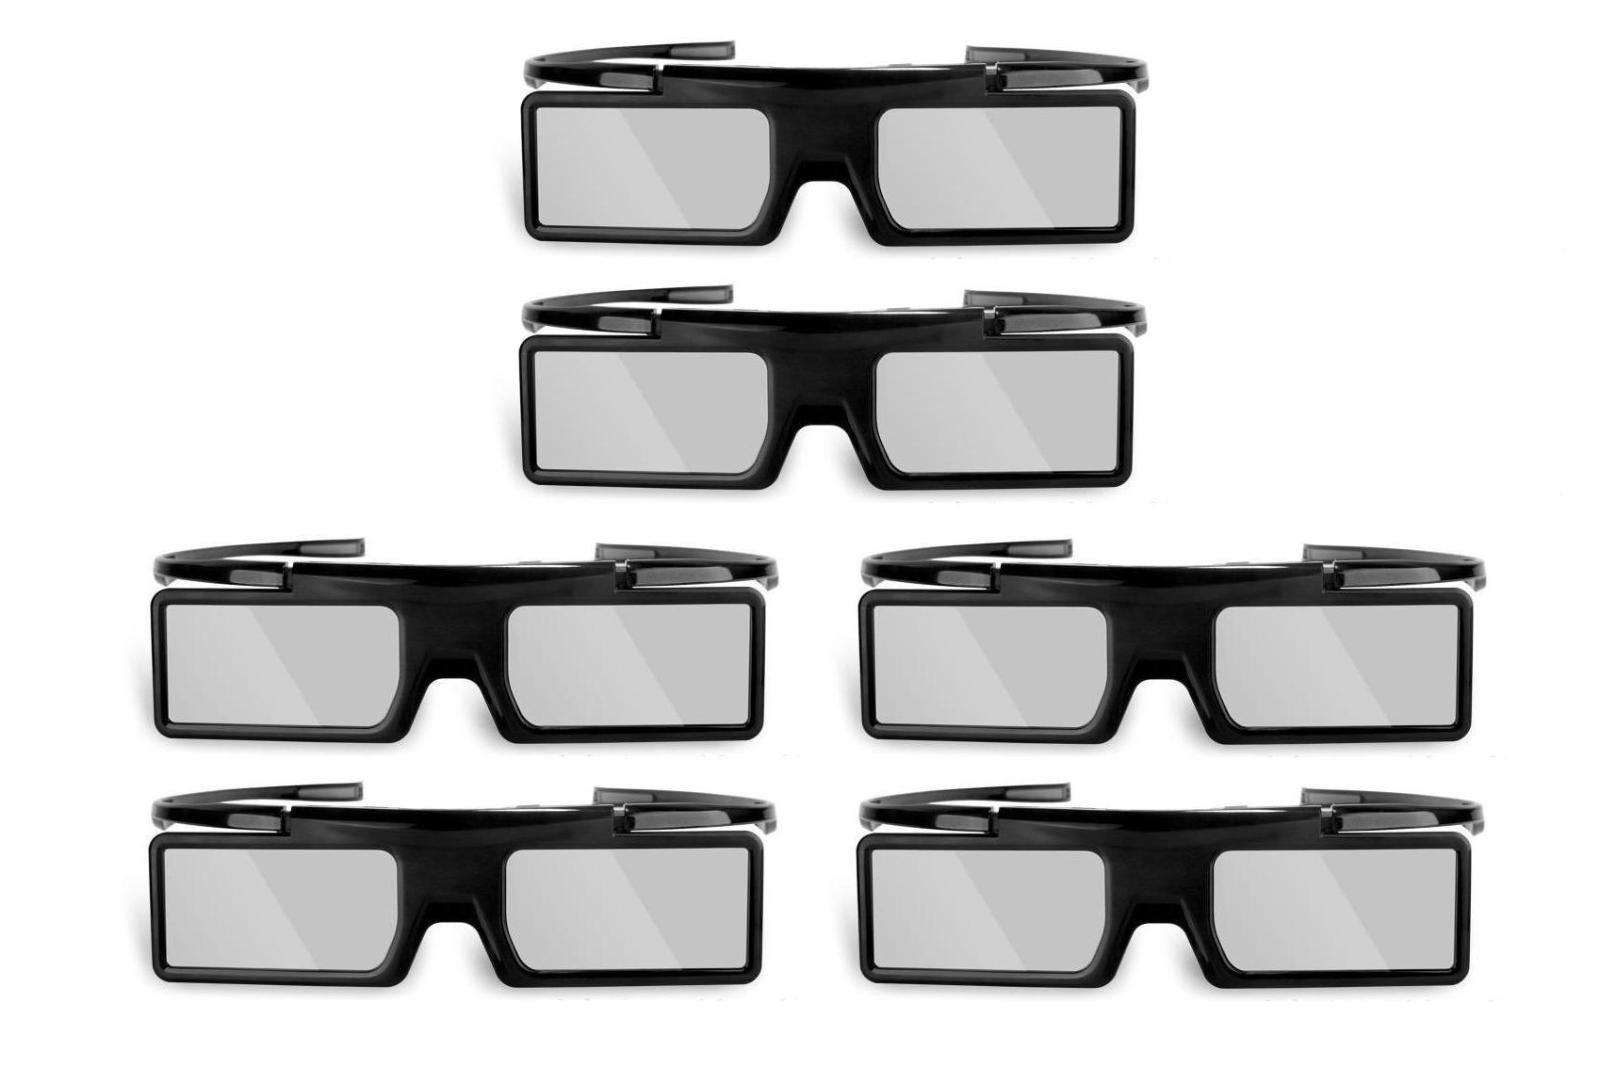 Lot of 6 3D Active Shutter Glasses for 2015 Sony 3D TV